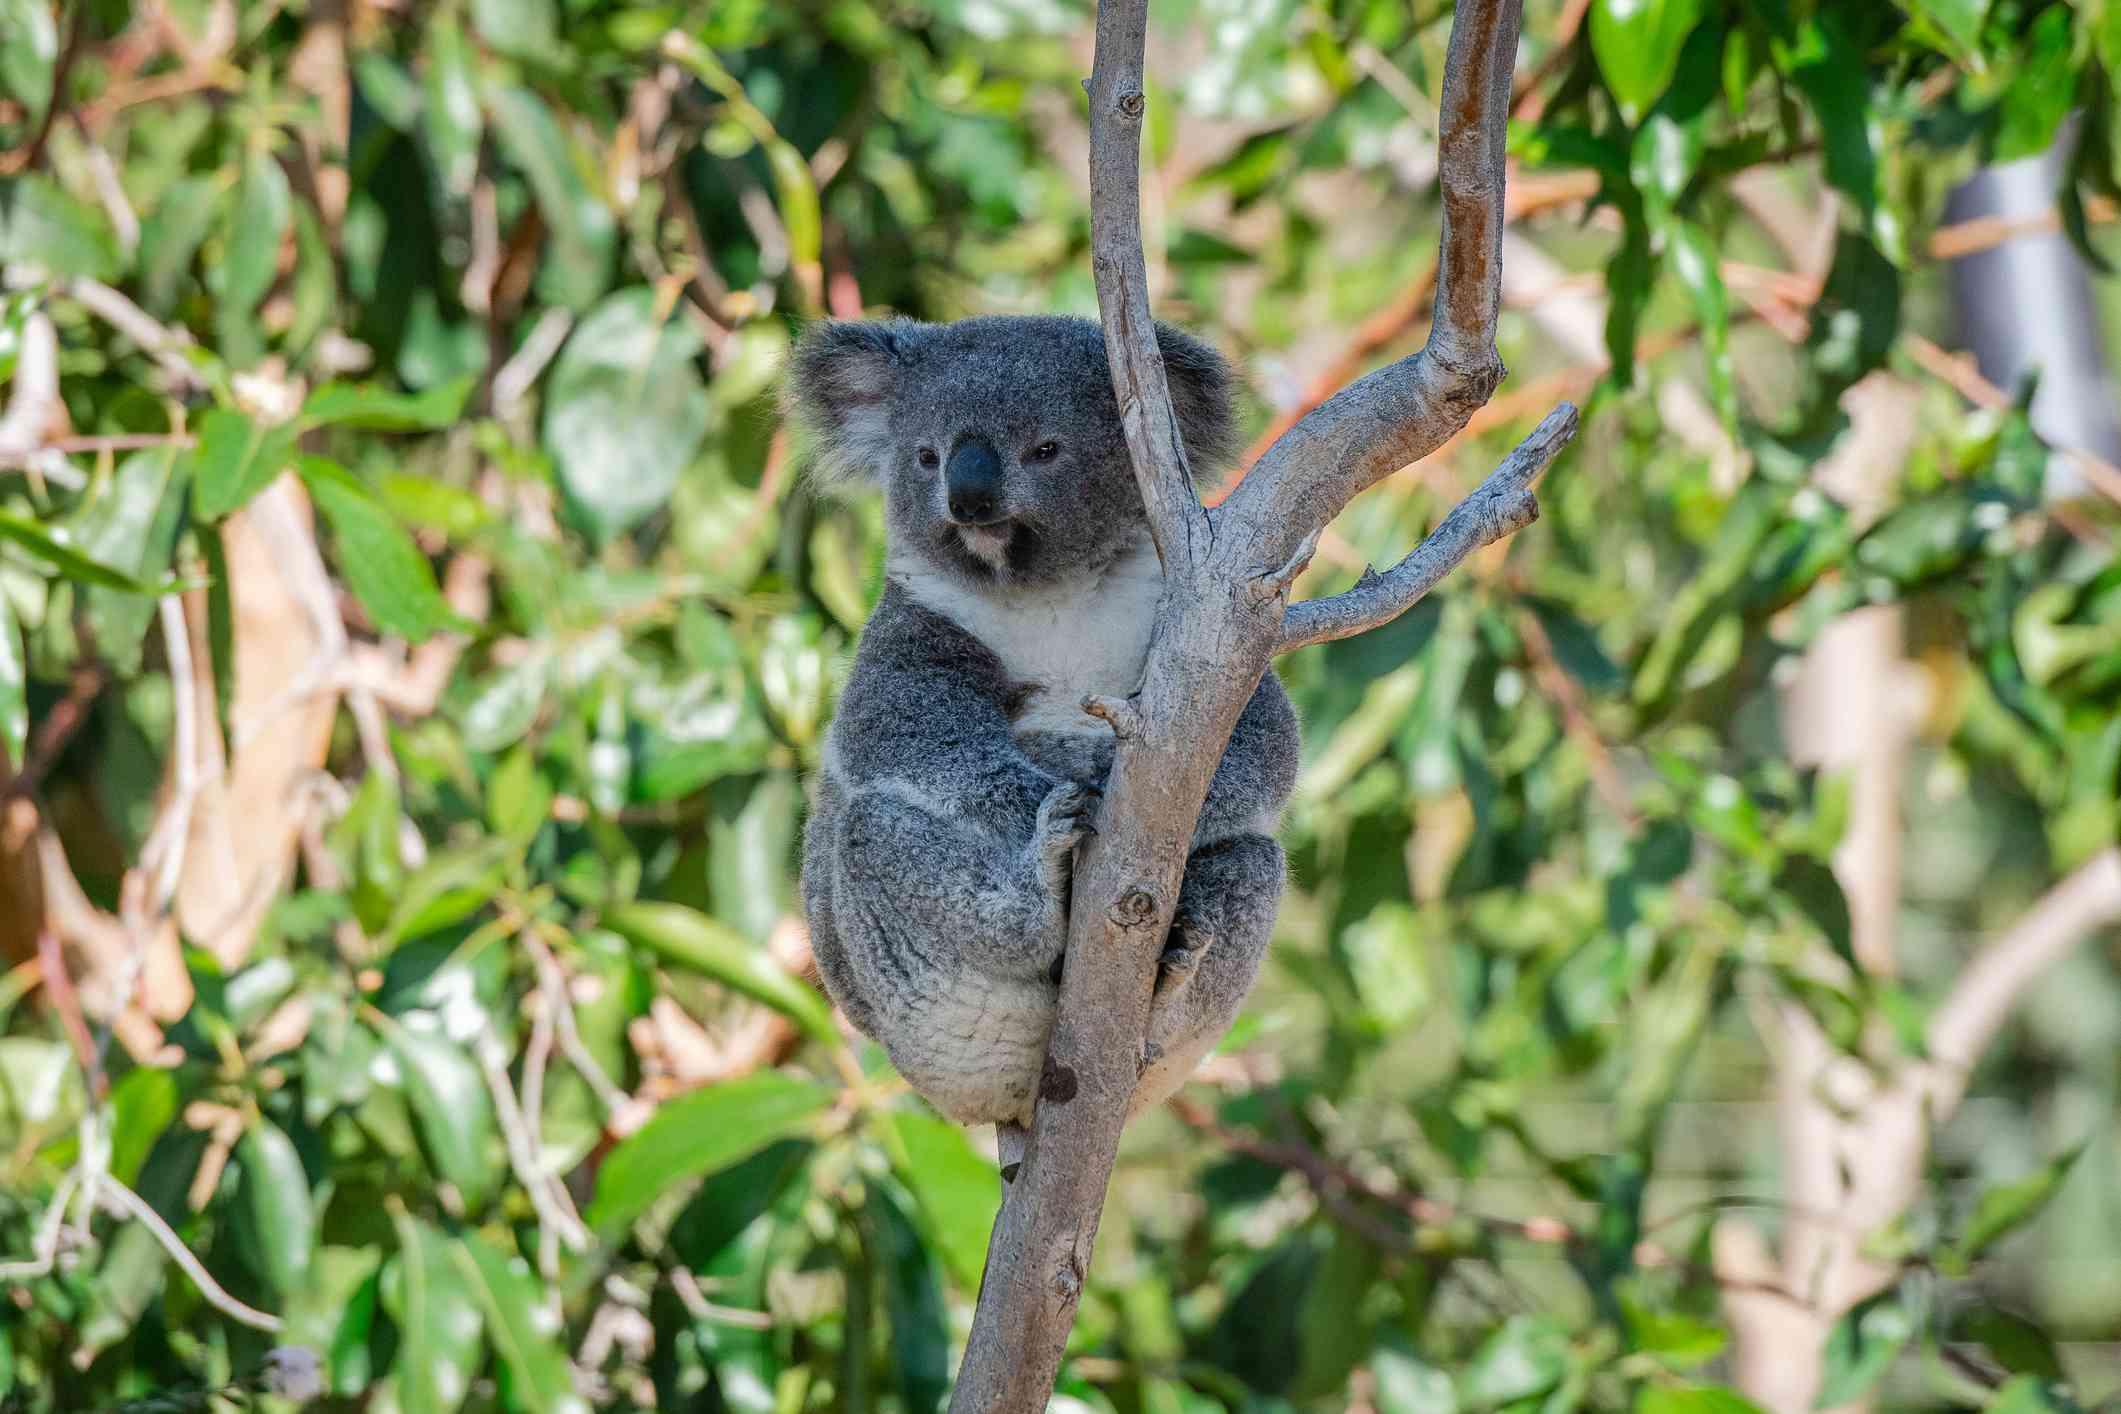 A gray koala holding onto the side of a tree